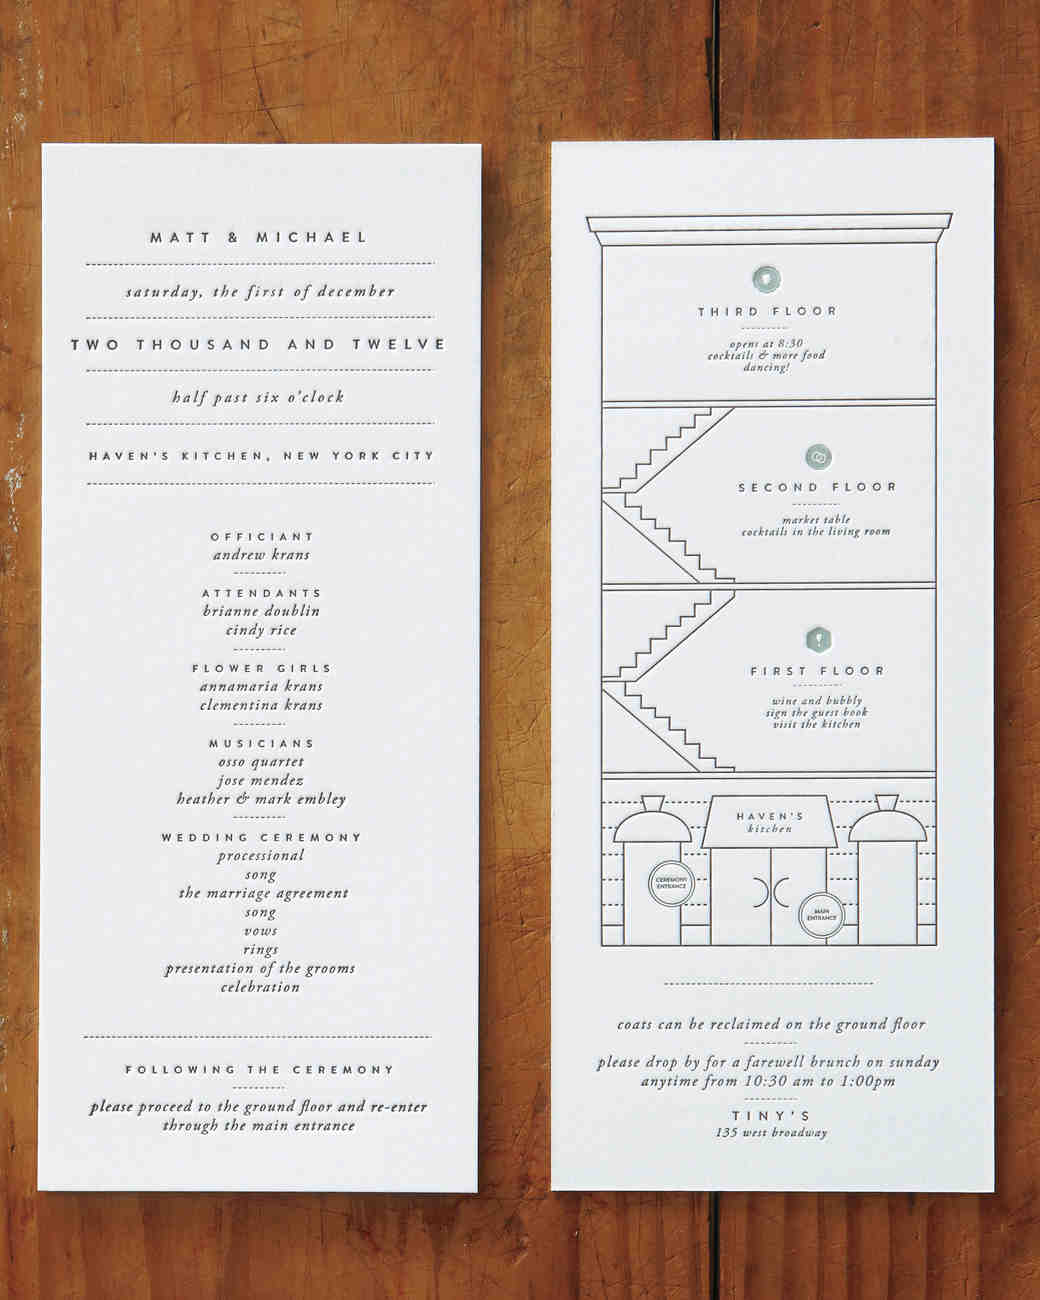 martha stewart wedding invitations michaels wedding invitations michaels Martha Stewart Wedding Invitations Michaels